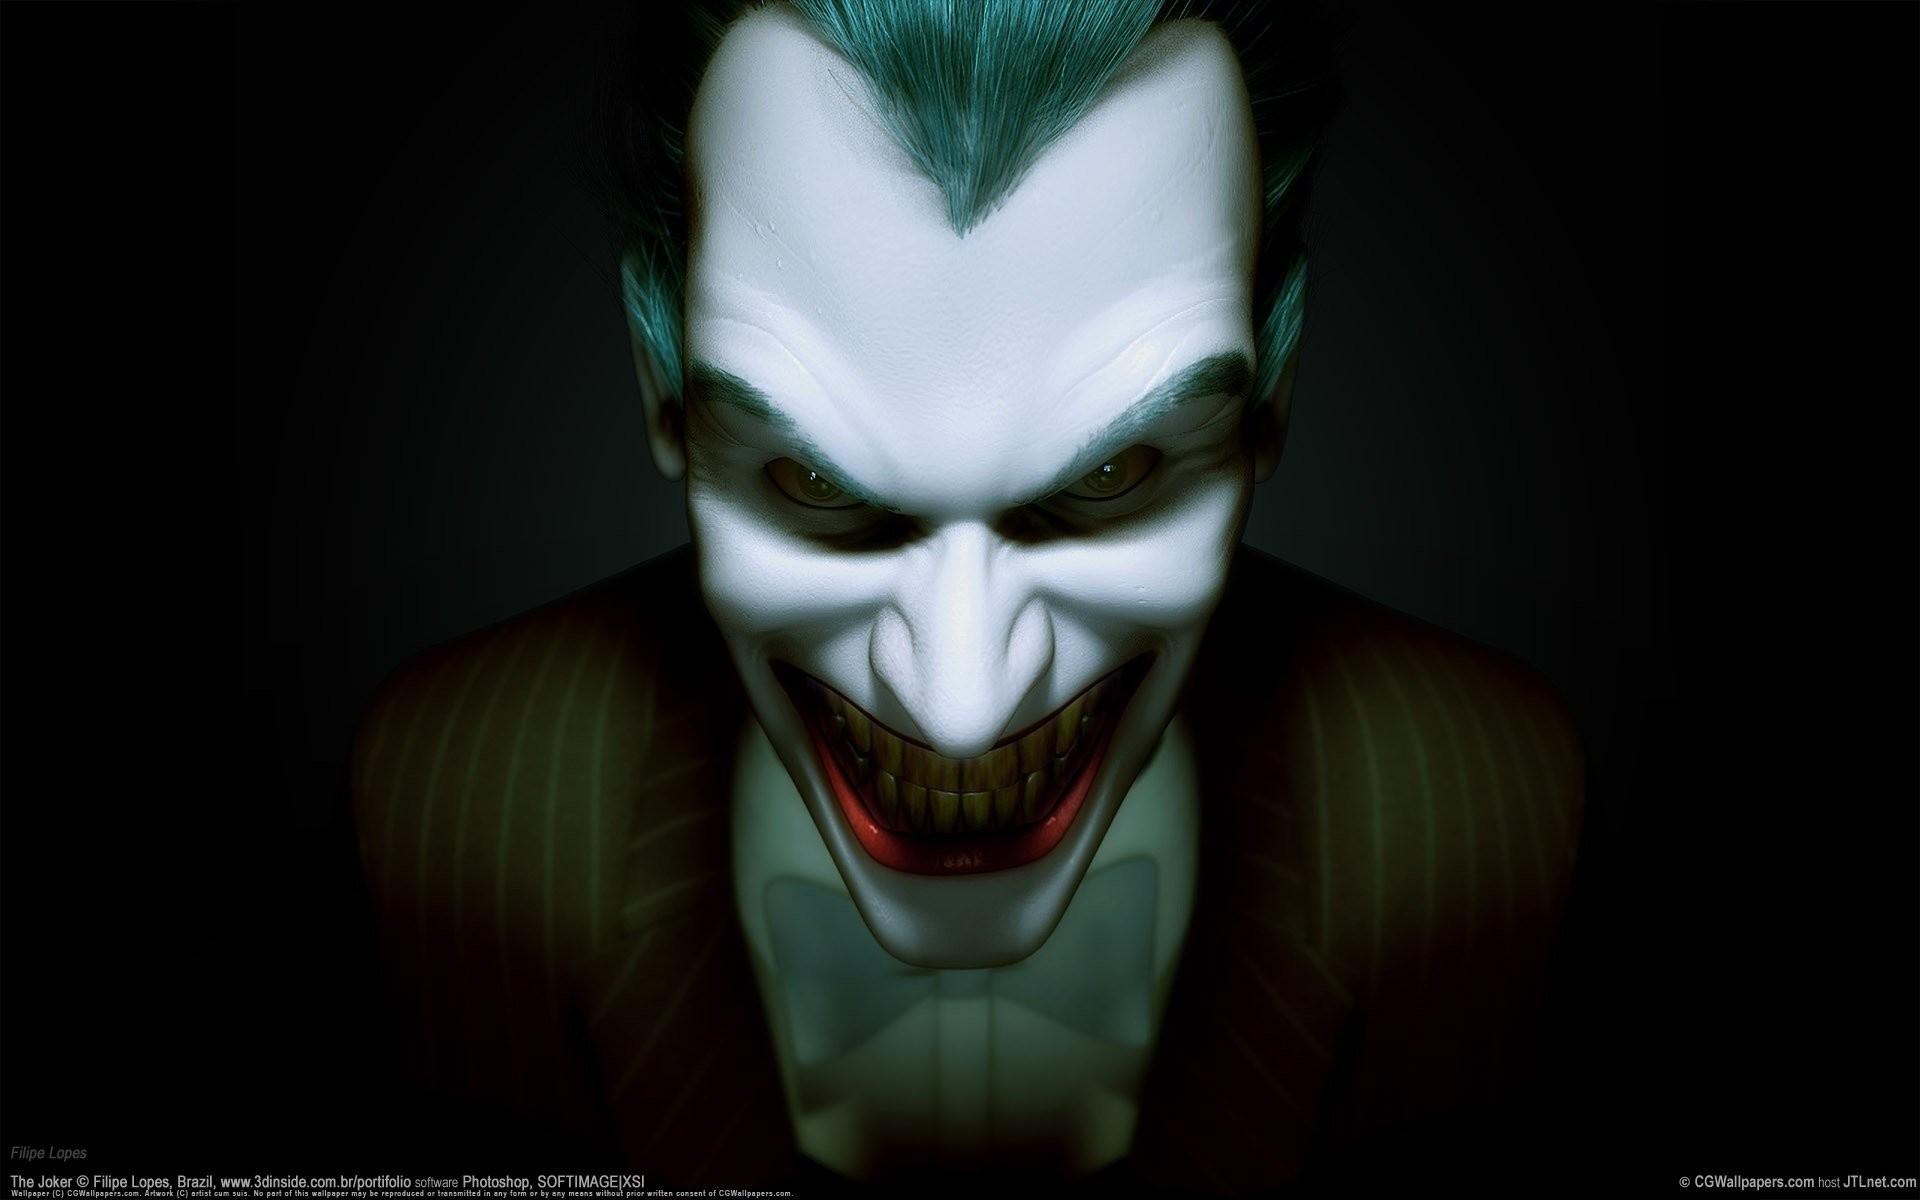 Beautiful Wallpaper Macbook Joker - 1032524-most-popular-scary-joker-wallpaper-1920x1200-for-macbook  Collection_559875.jpg